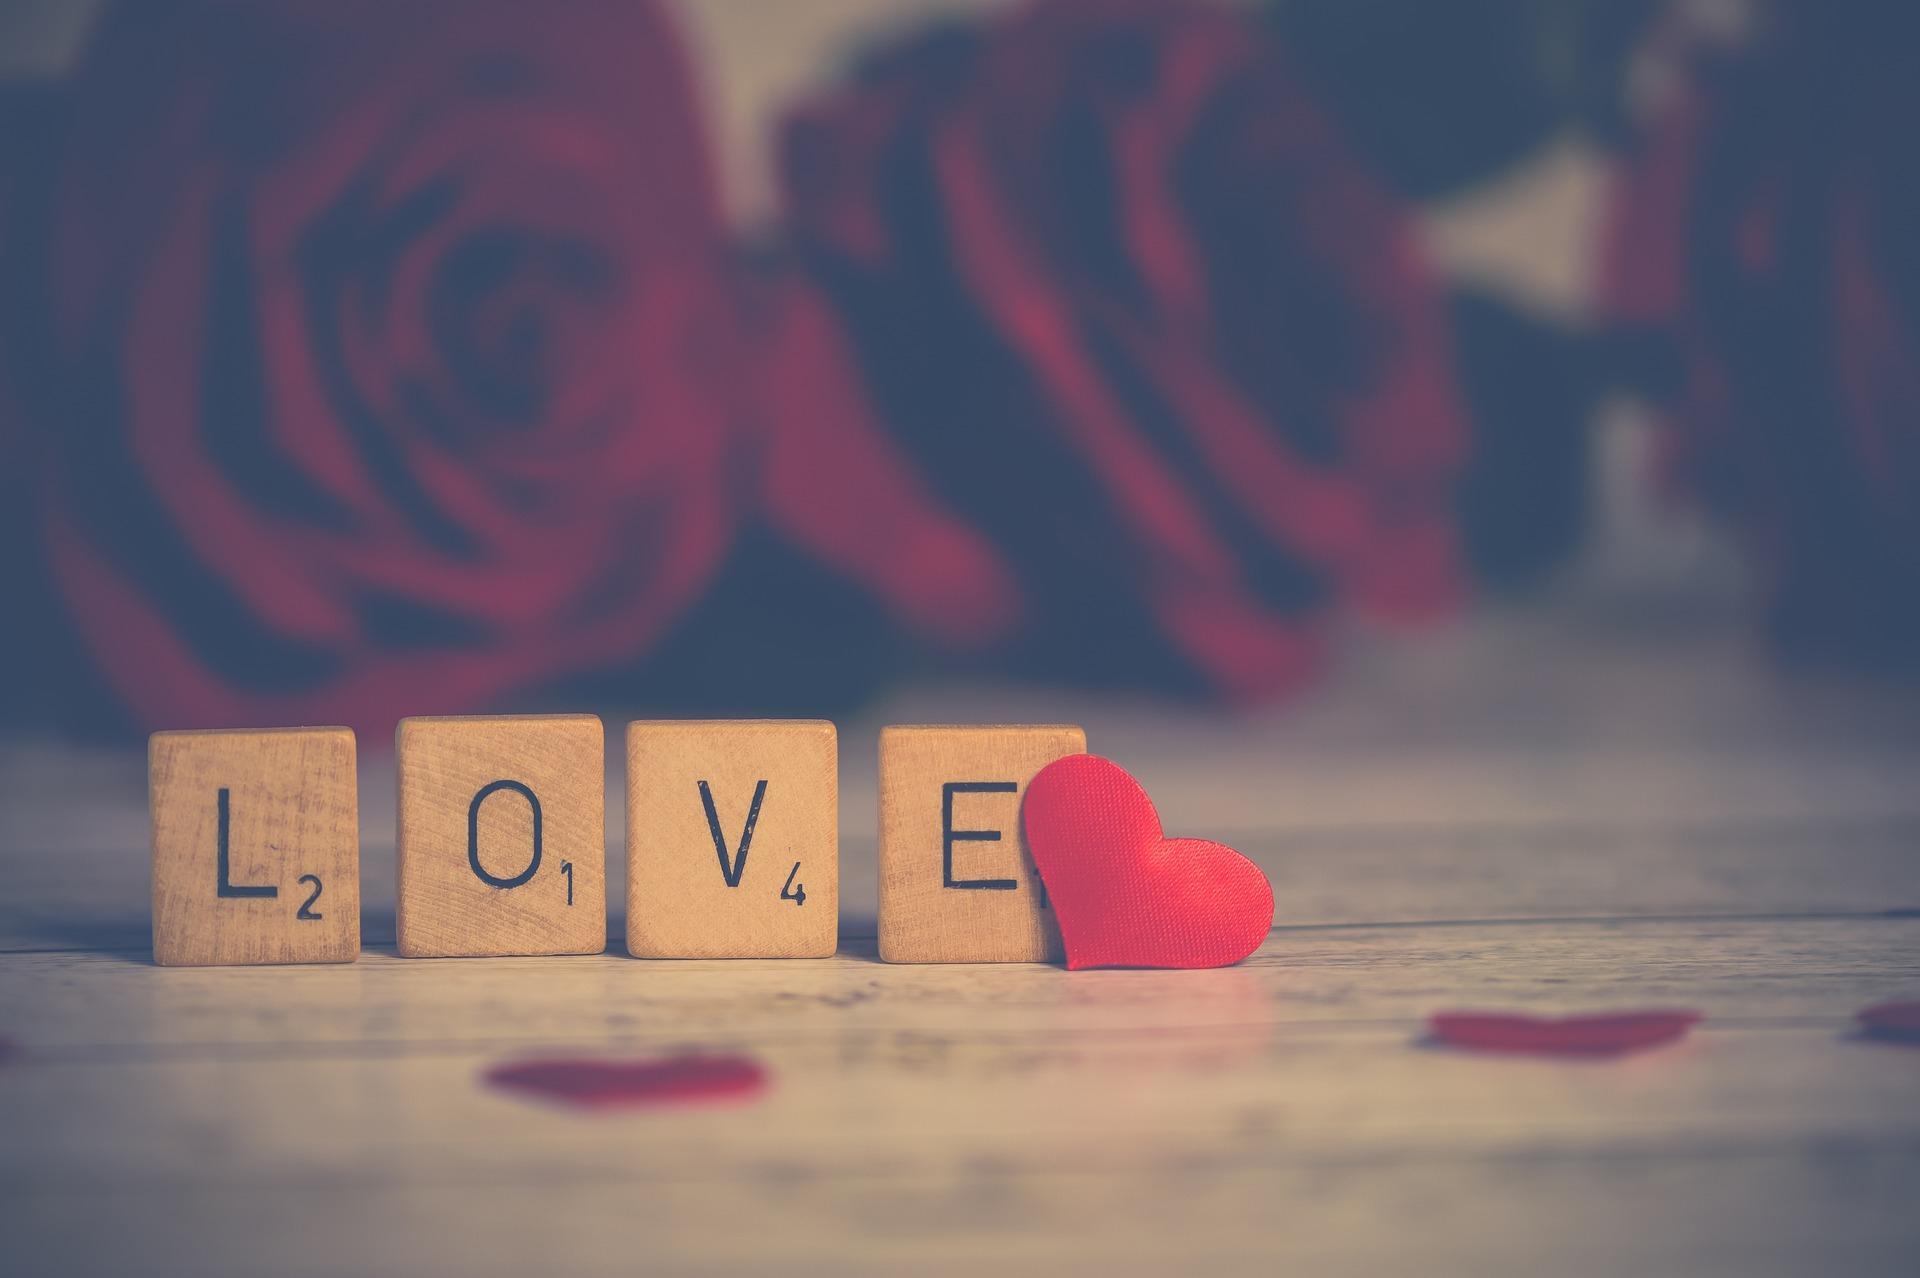 download wallpaper: Scrabble LOVE wallpaper